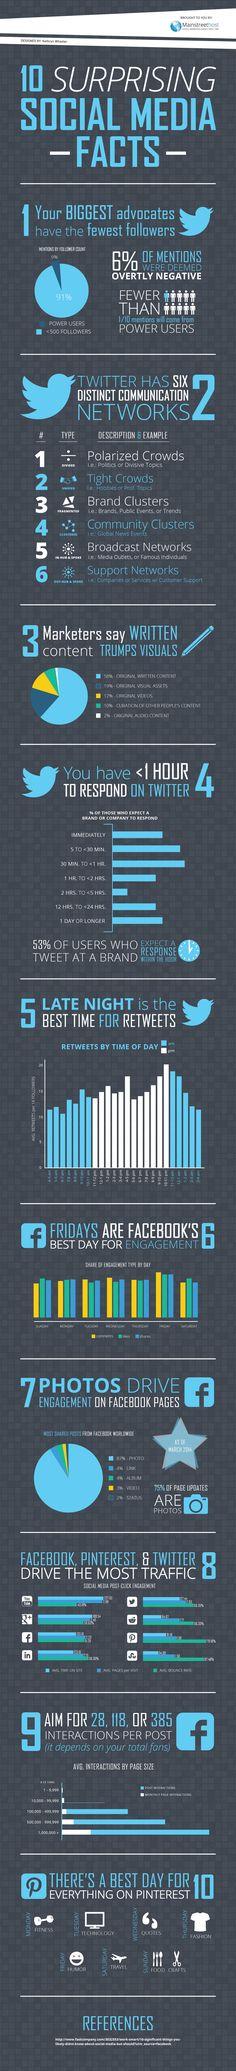 10 Crazy #SocialMediaFacts that Are #ACTUALLY #True